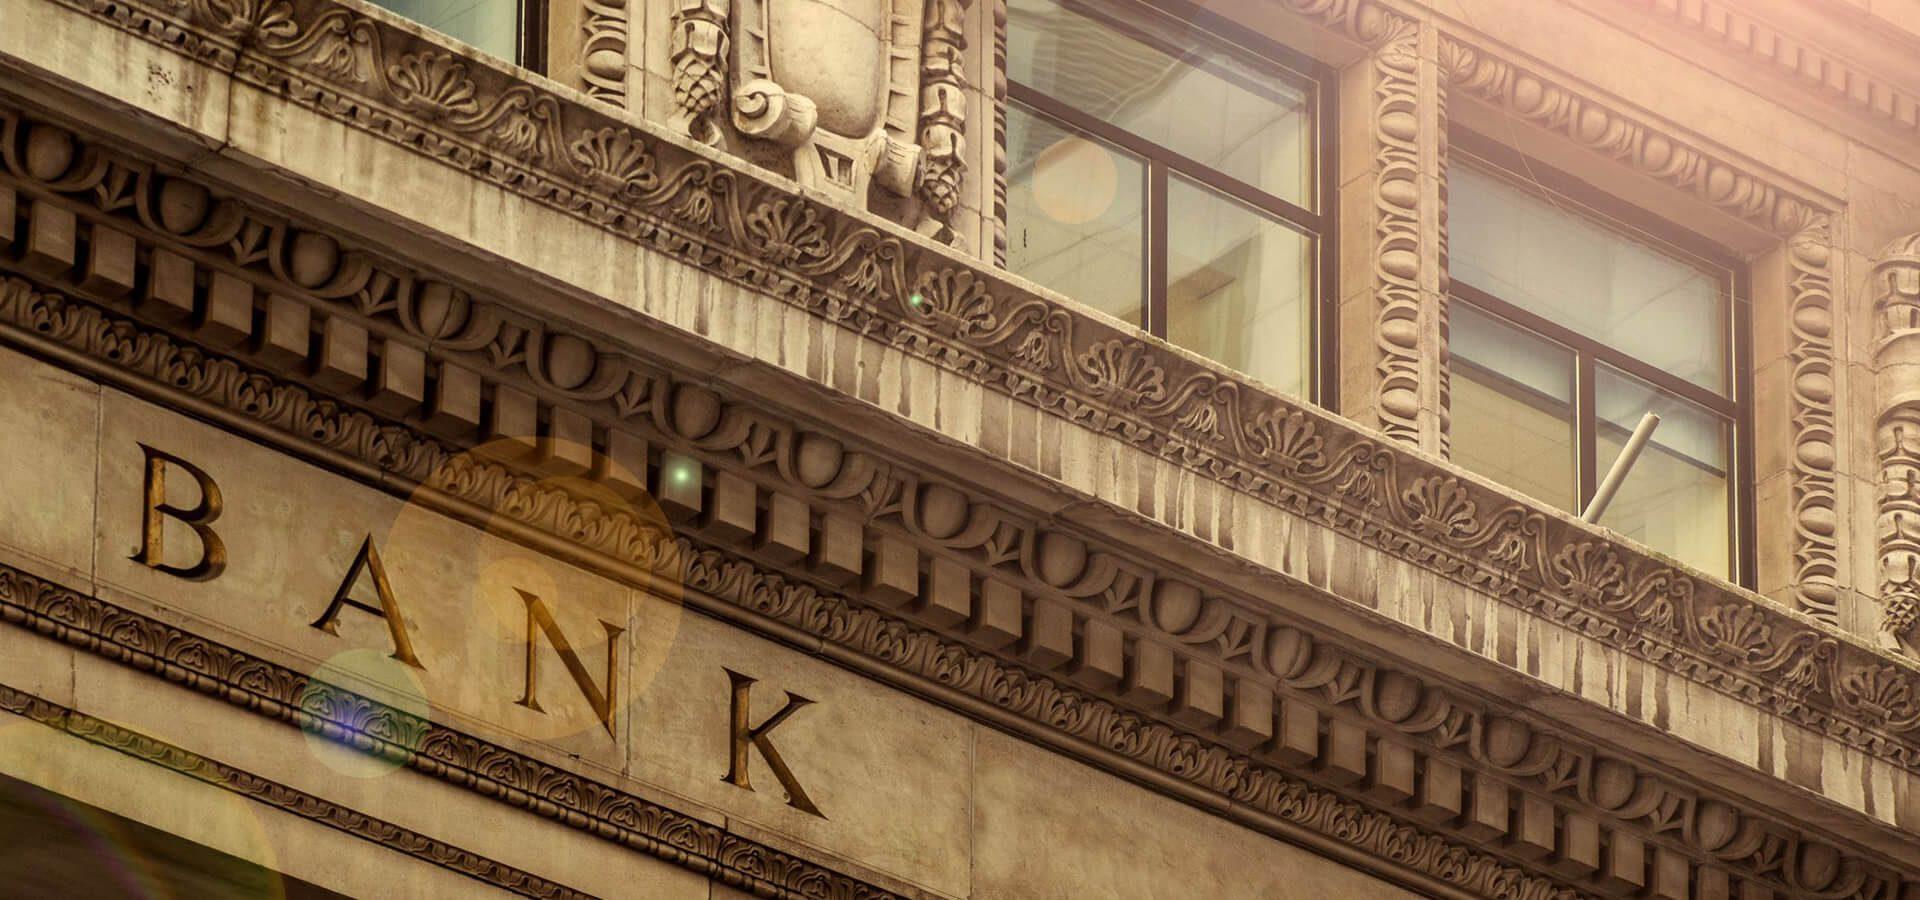 The 3 determinants of reputational risk for banks